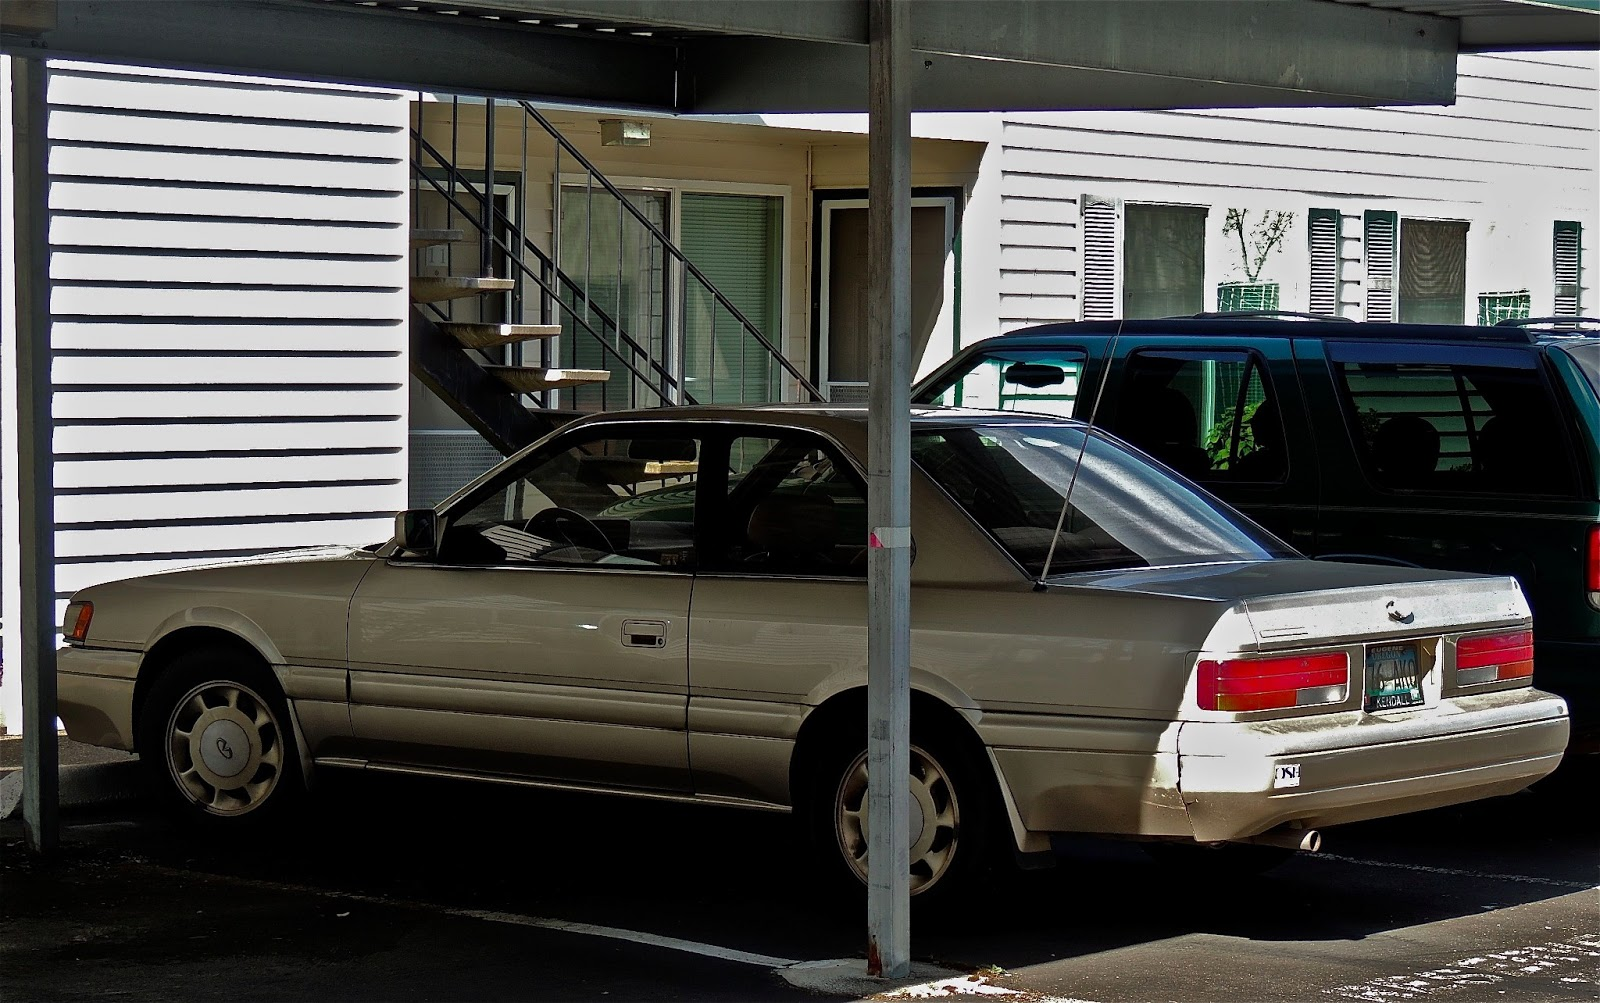 Parking Lot 1989 Parking Lot Spot 1989-92